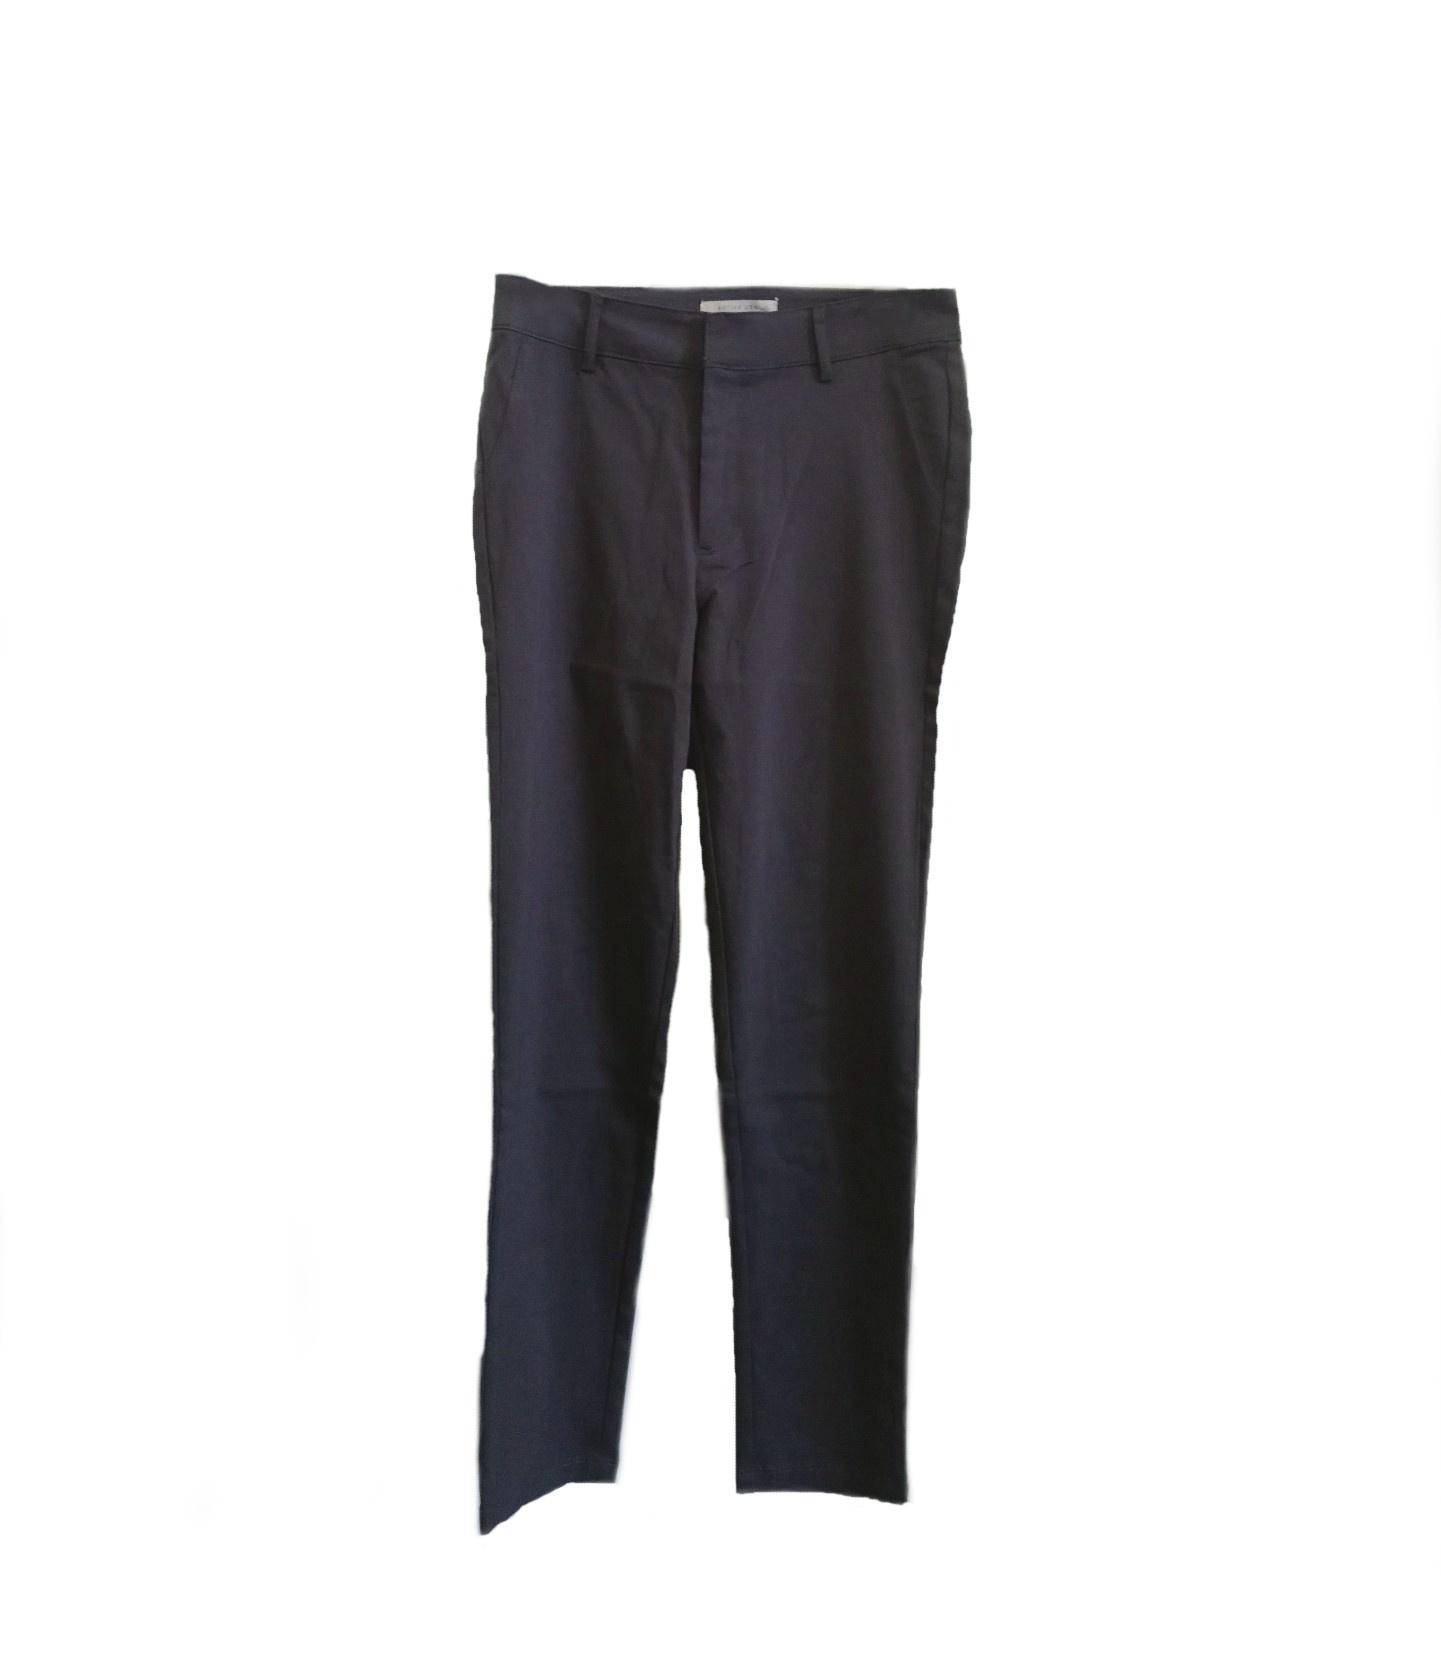 Bengaline Charcoal Pants